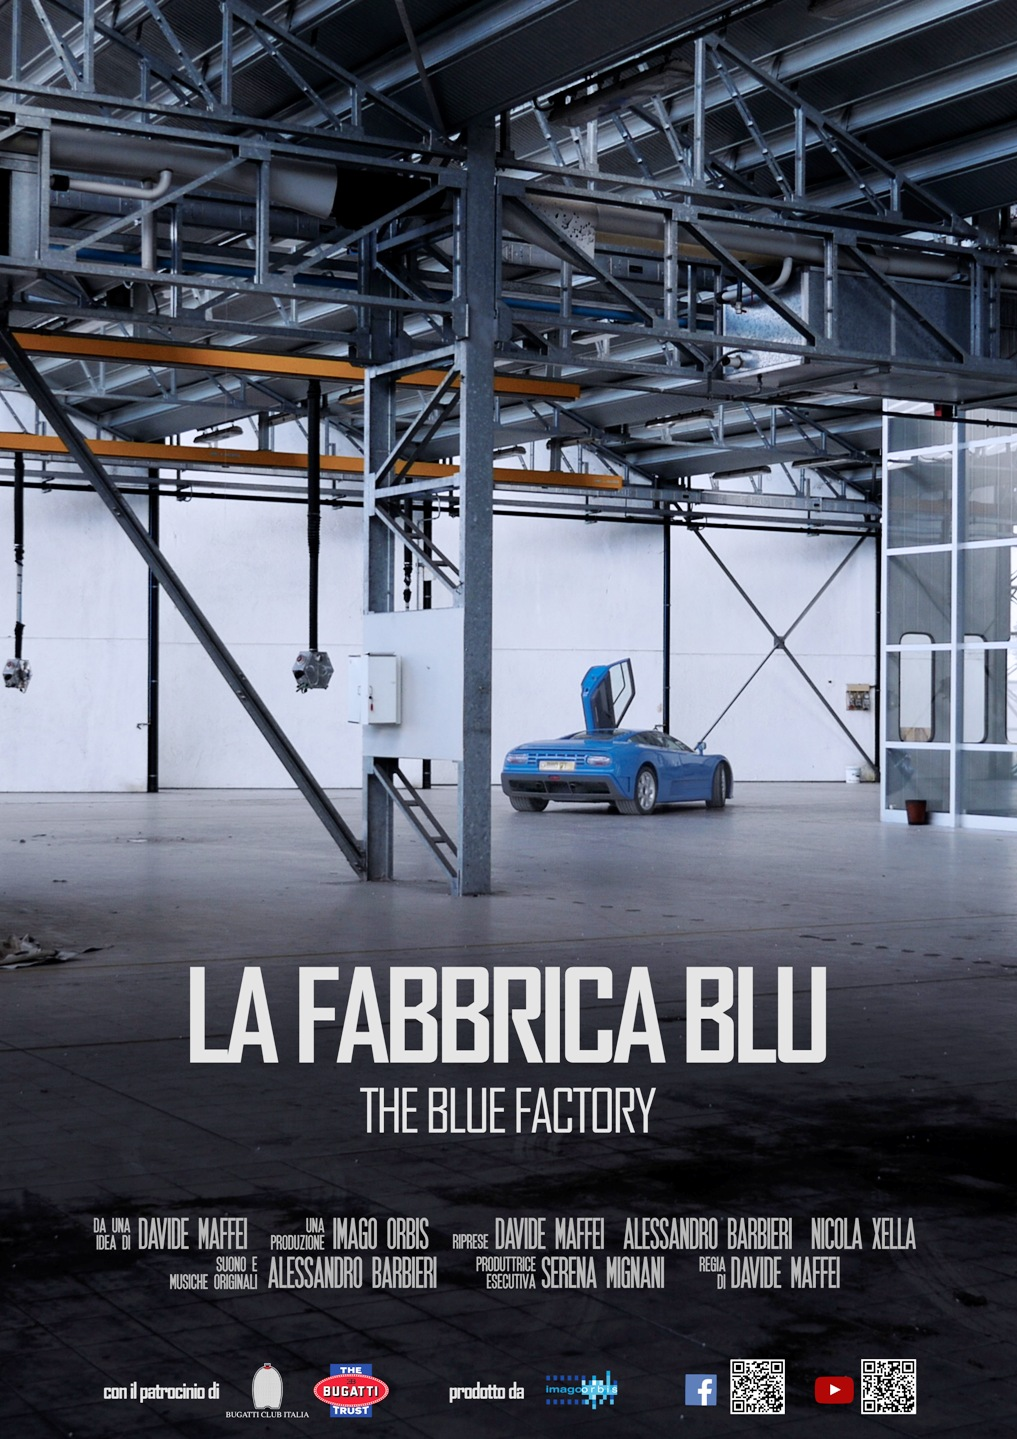 Locandina del docufilm La fabbrica Blu